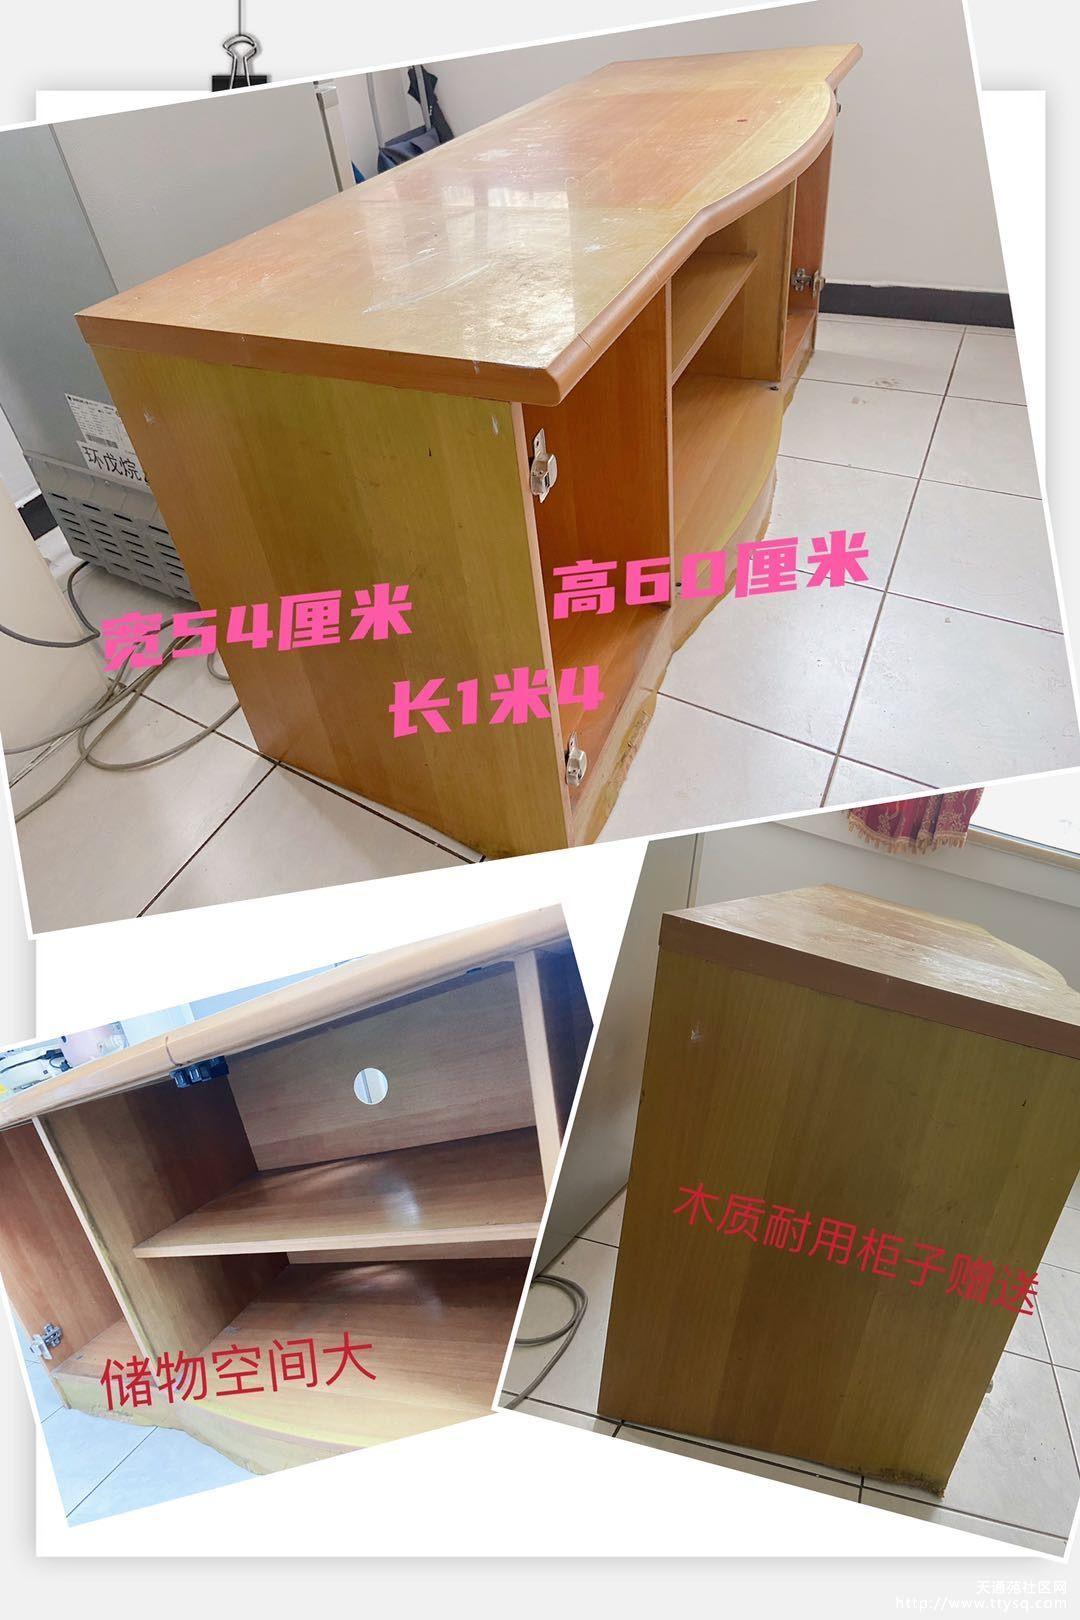 wechat_upload162694944760f947470f135